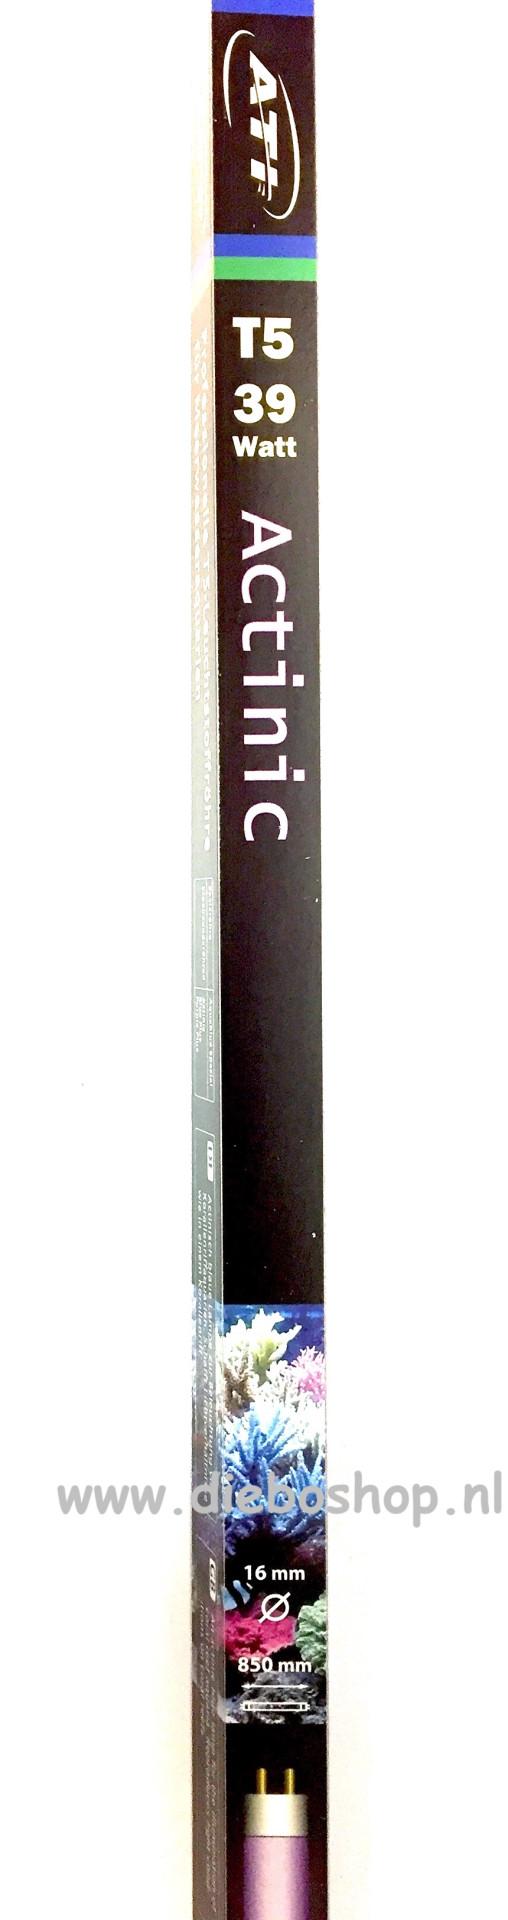 Ati Actinic T5 39 Watt